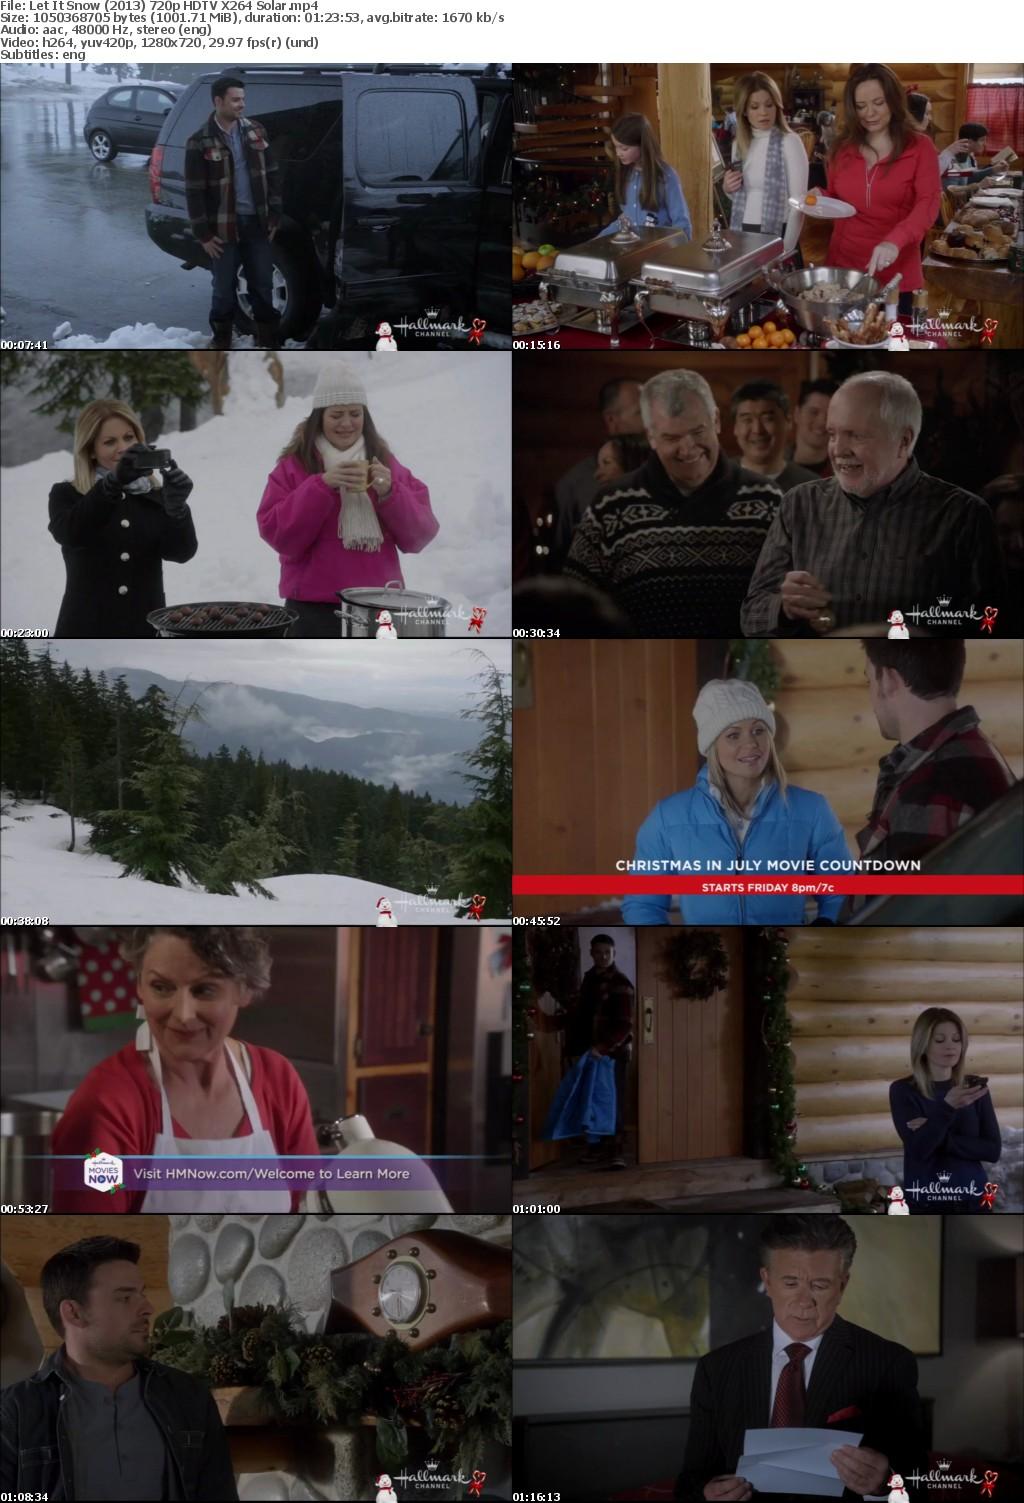 Let It Snow 2013 Hallmark 720p HDTV X264 Solar